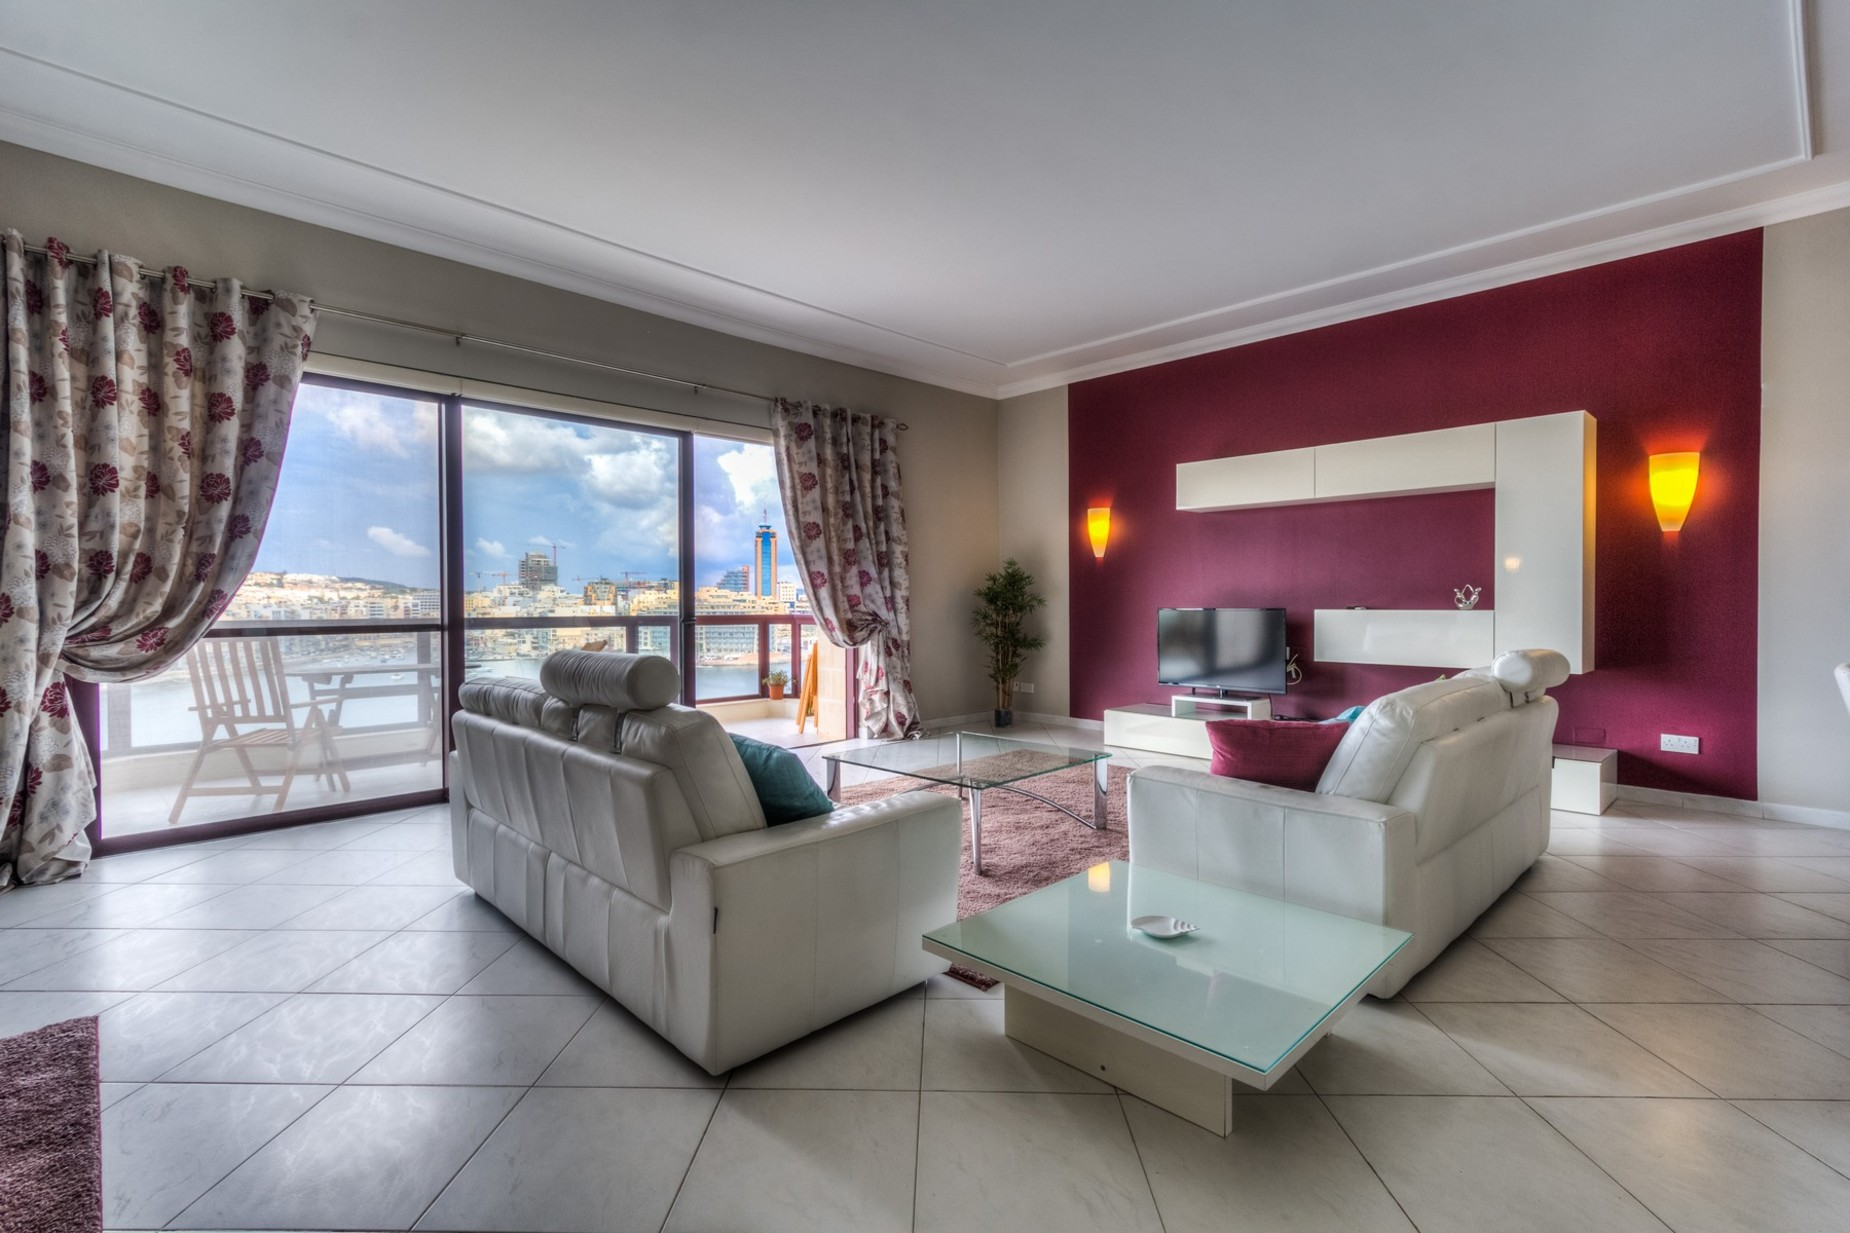 4 bed Apartment For Rent in Sliema, Sliema - thumb 2